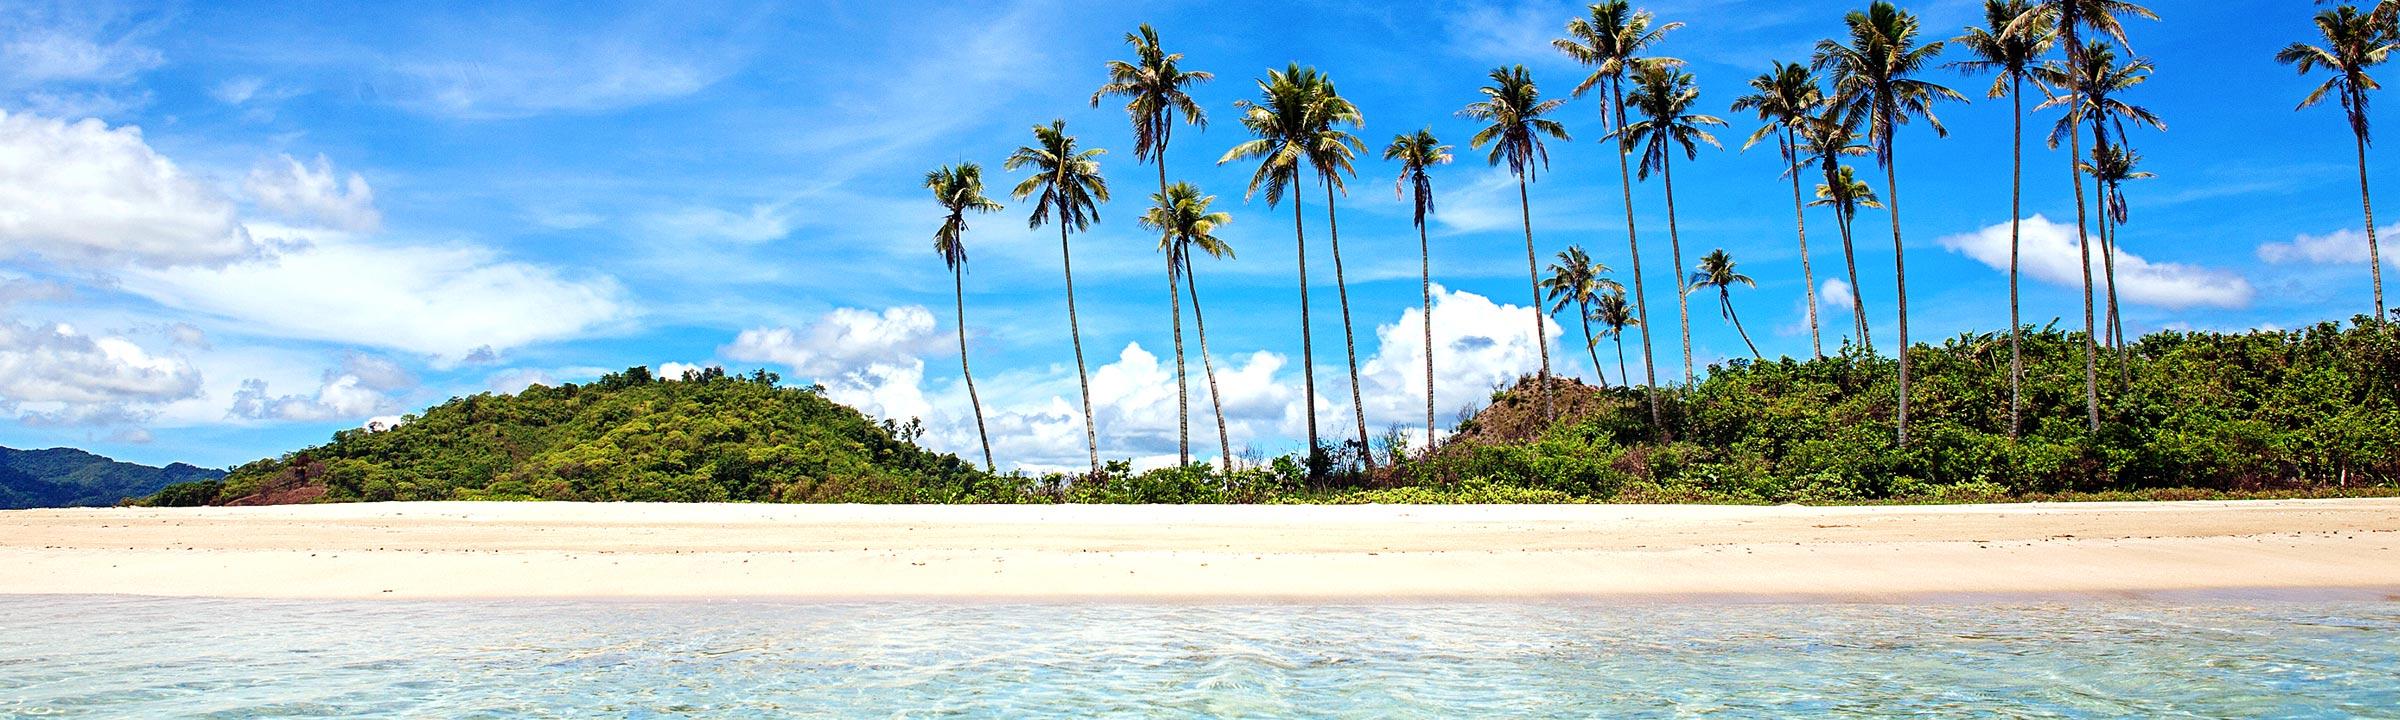 plage-hawai